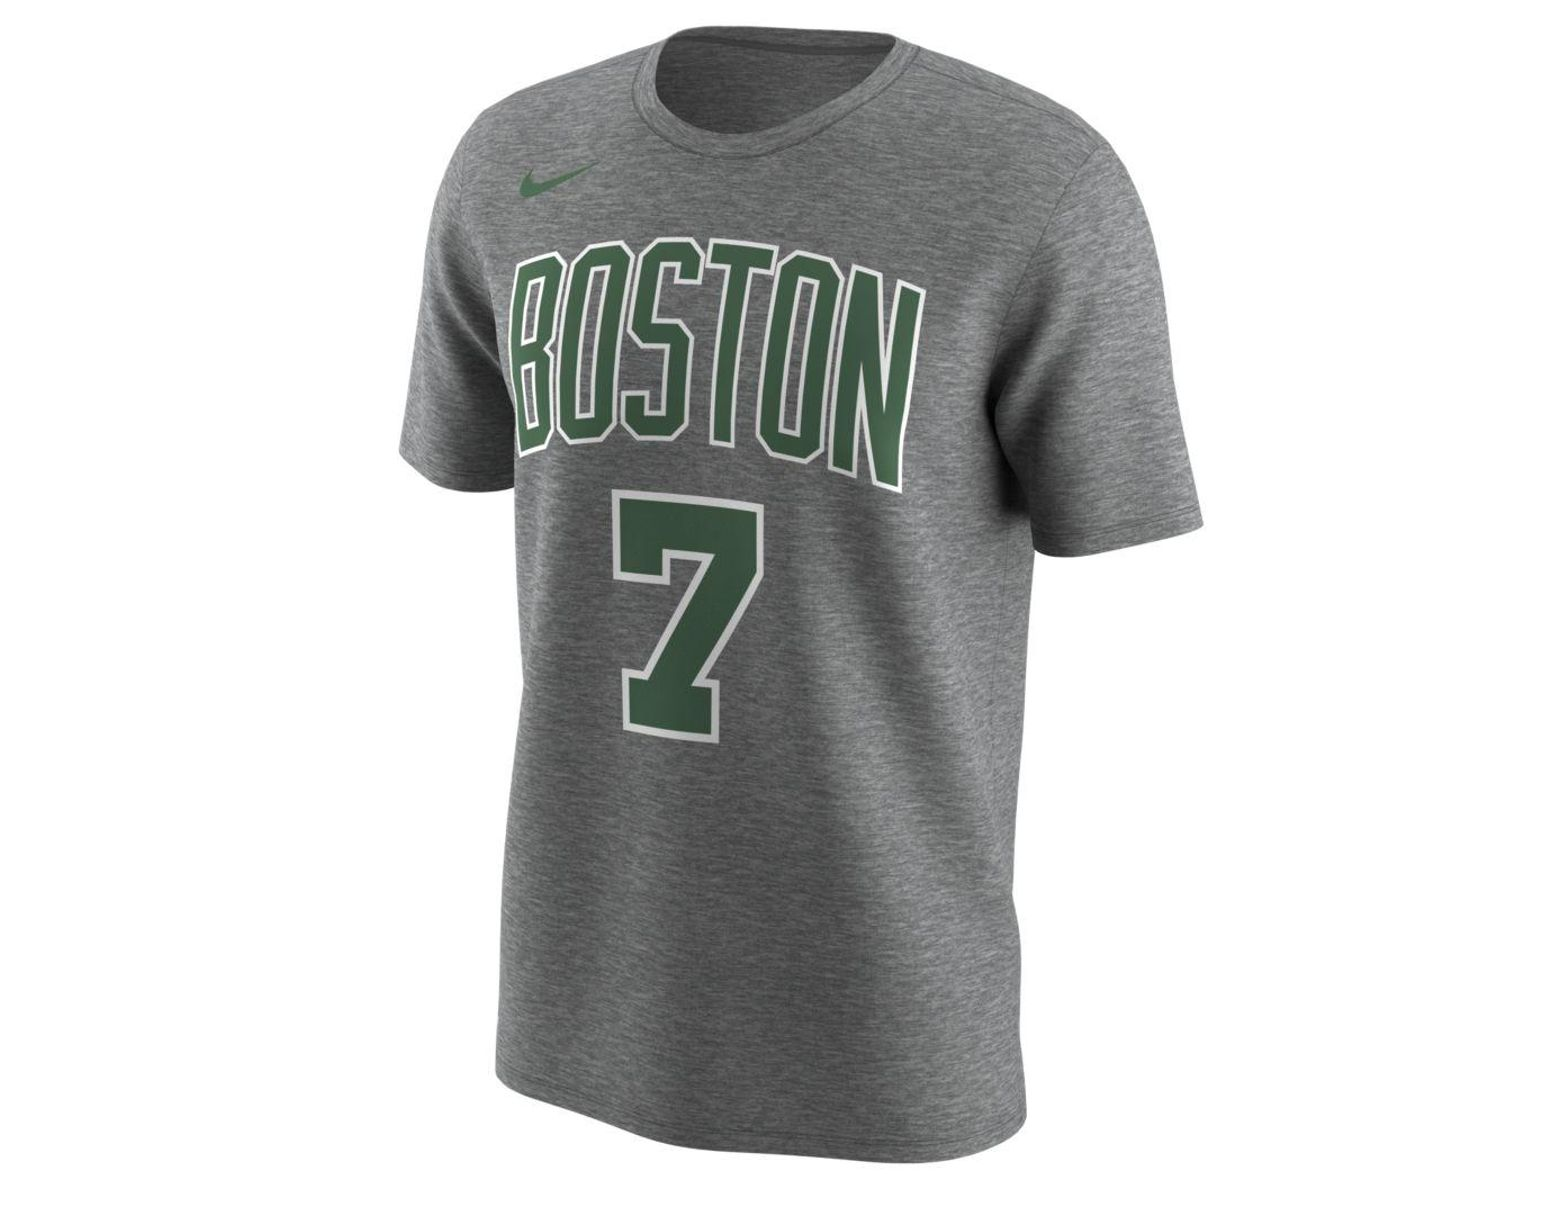 official photos 63bdd 58195 Nike Boston Celtics City Edition (jaylen Brown) Dri-fit Nba ...